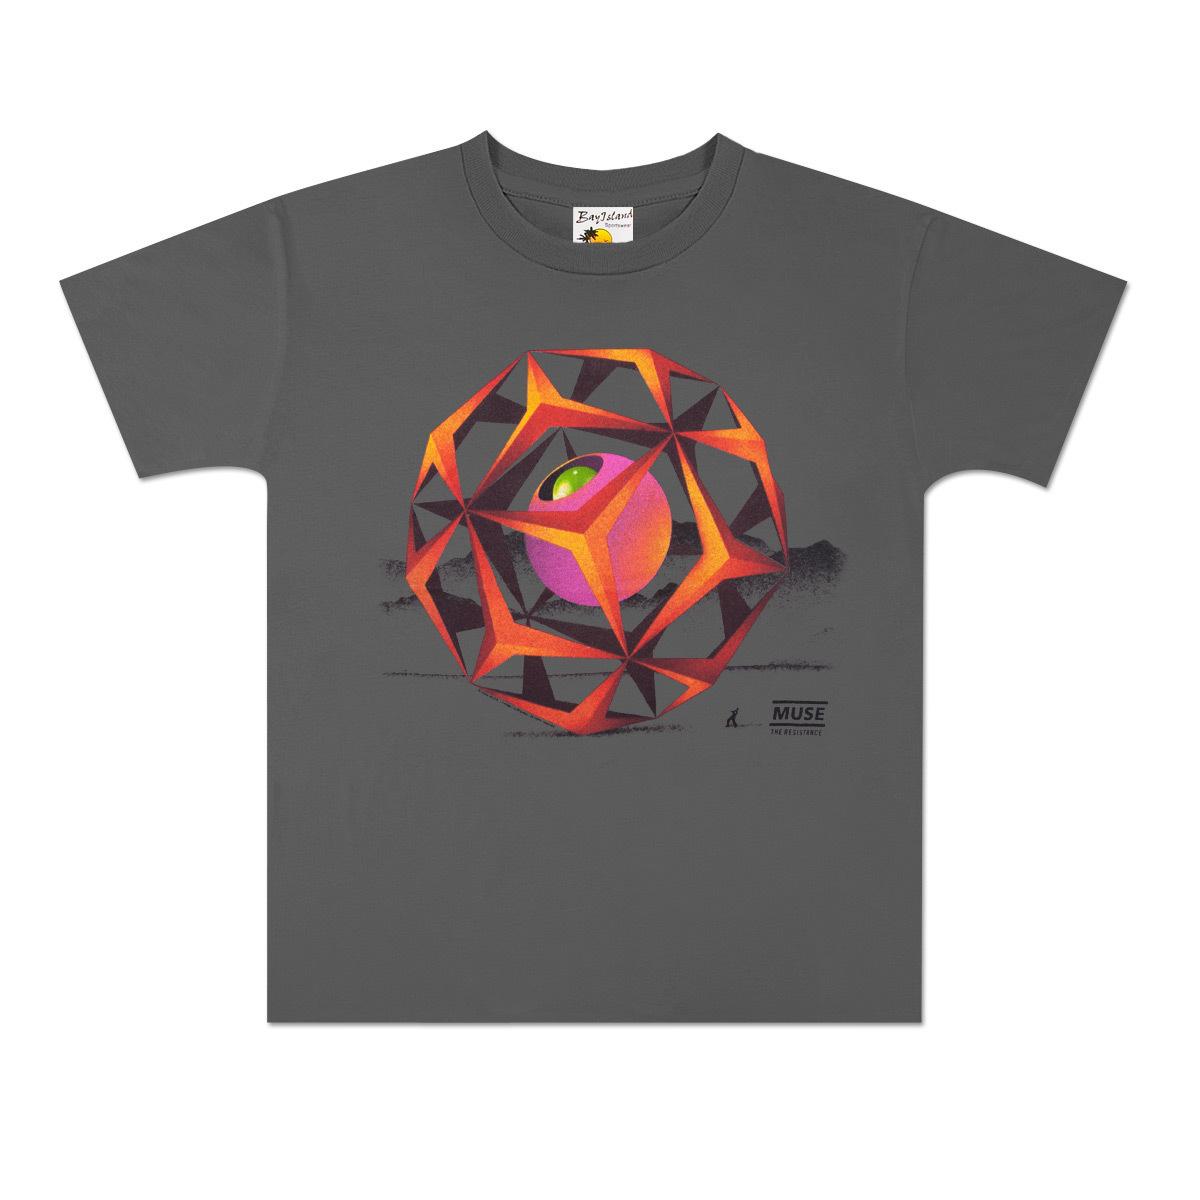 muse modular youth t shirt shop the bravado superstore. Black Bedroom Furniture Sets. Home Design Ideas